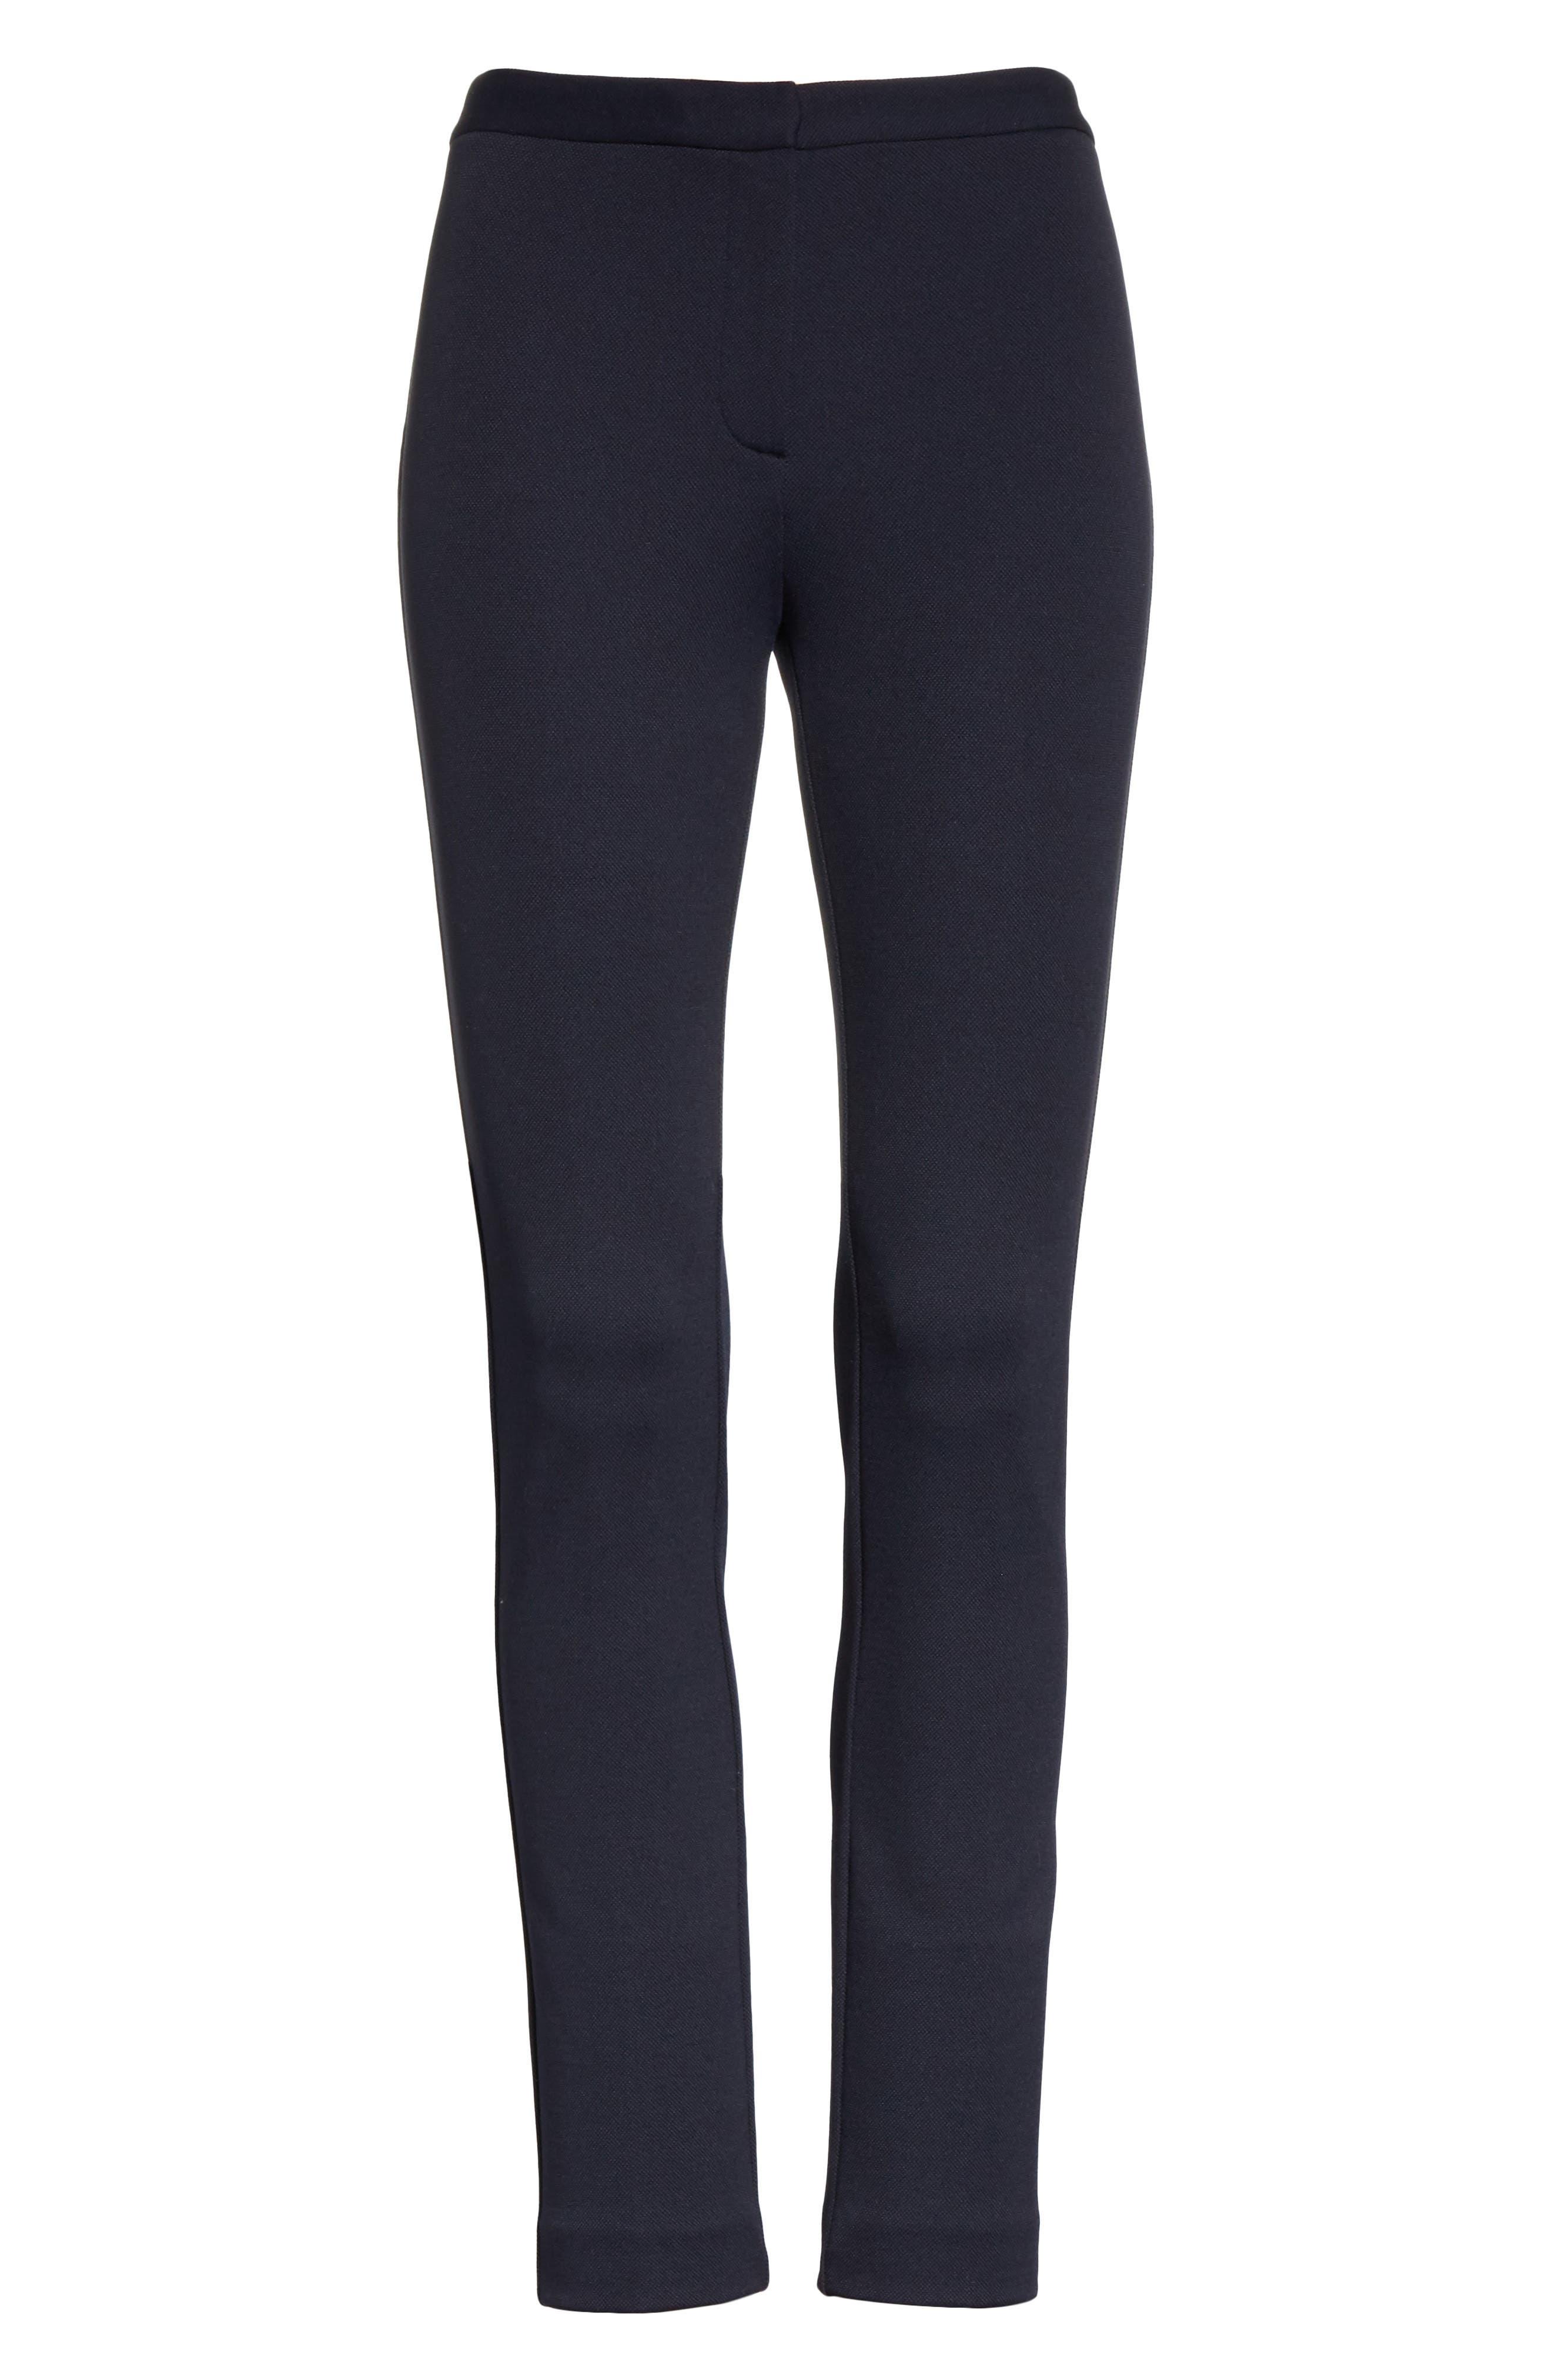 Piqué Skinny Pants,                             Alternate thumbnail 6, color,                             001